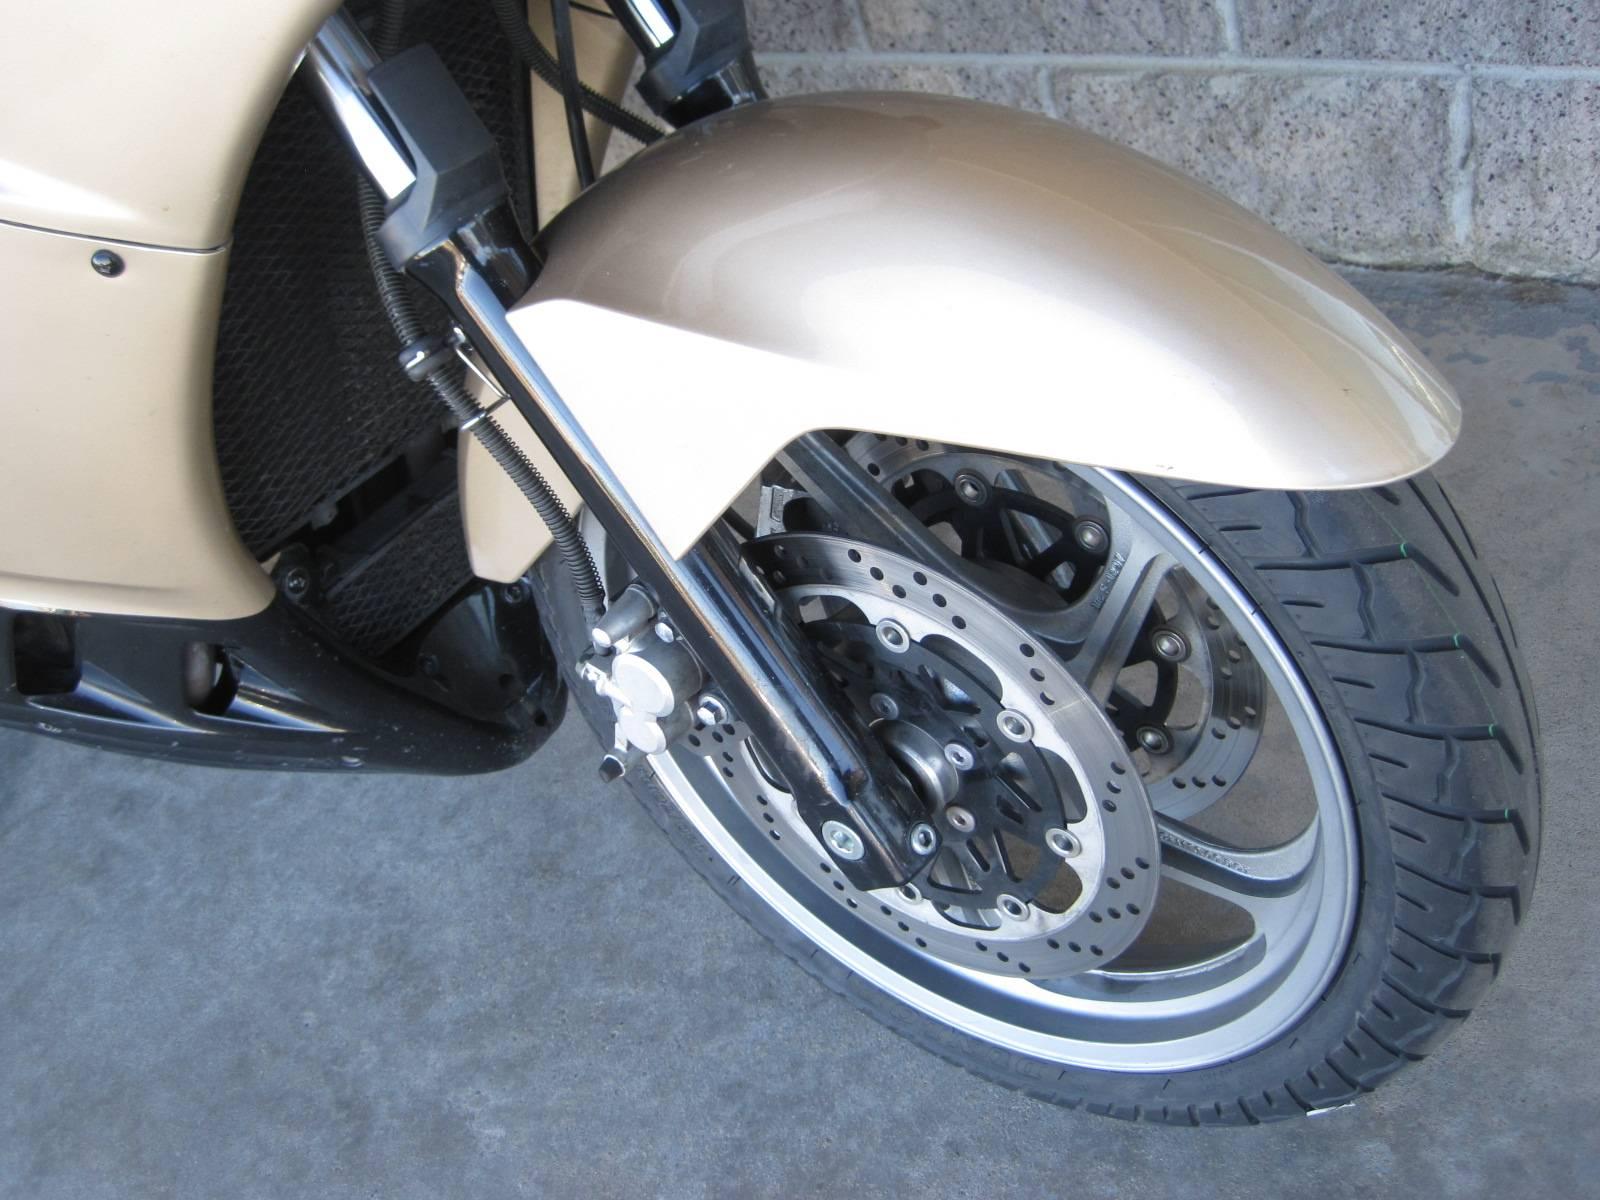 2005 Kawasaki Concours™ in Denver, Colorado